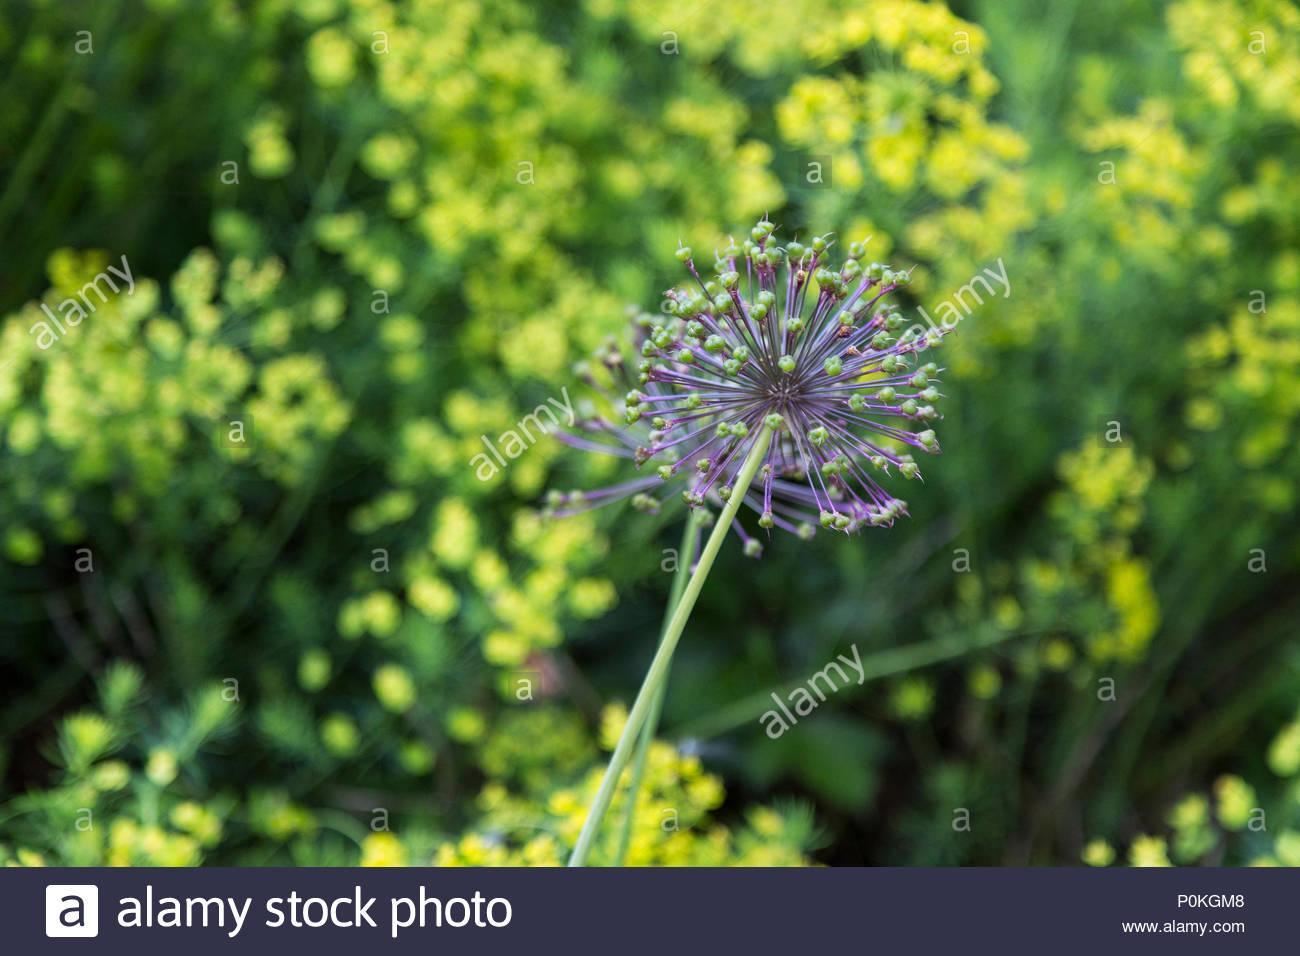 Purple Allium Flowers Starting To Bloom With Shorter Yellow Flowers